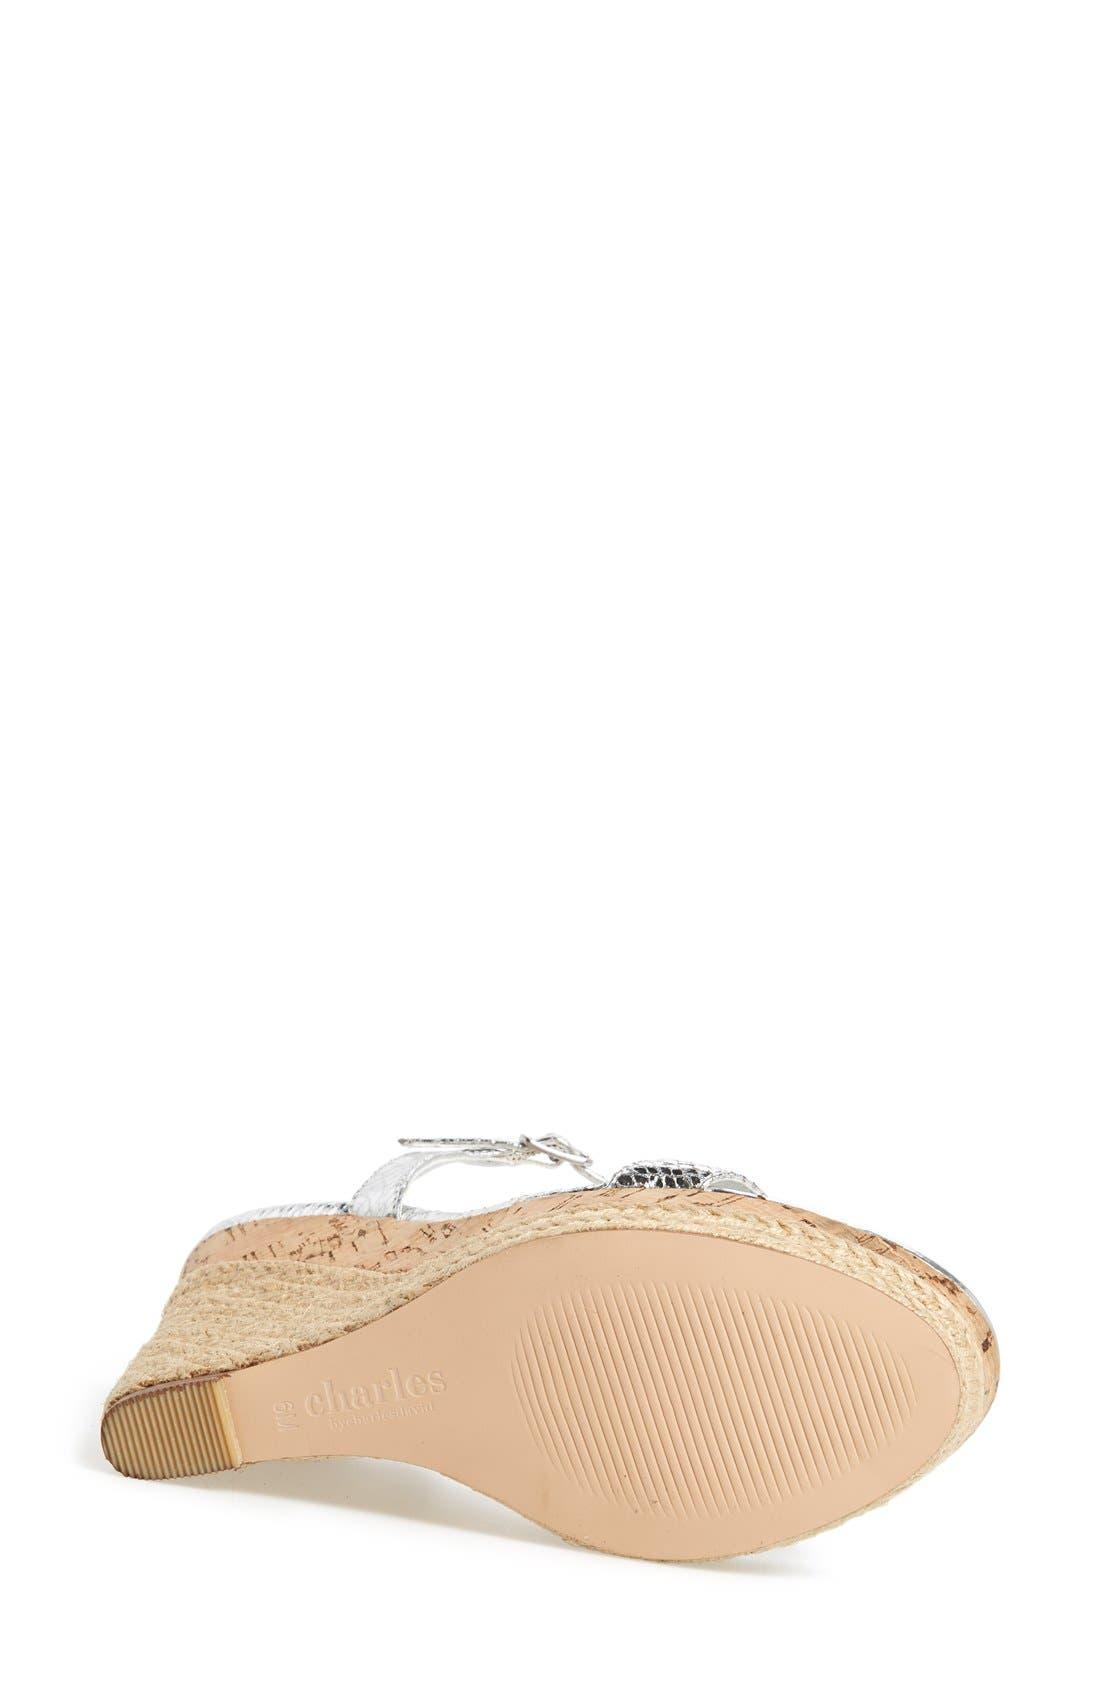 ,                             'Alabama' Espadrille Wedge Sandal,                             Alternate thumbnail 8, color,                             041